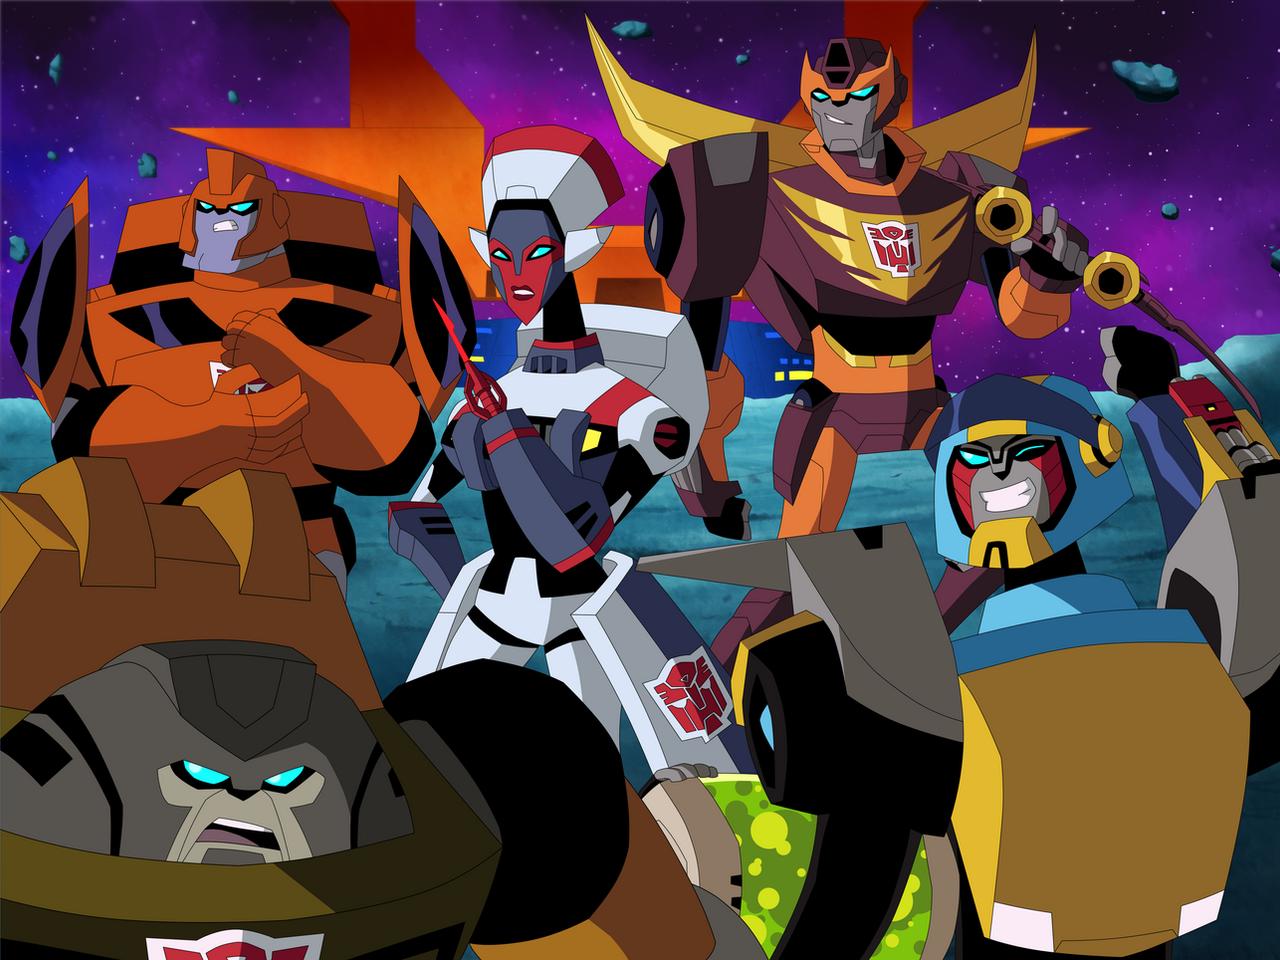 Defenders of Space Bridge 687-030 by Destron23